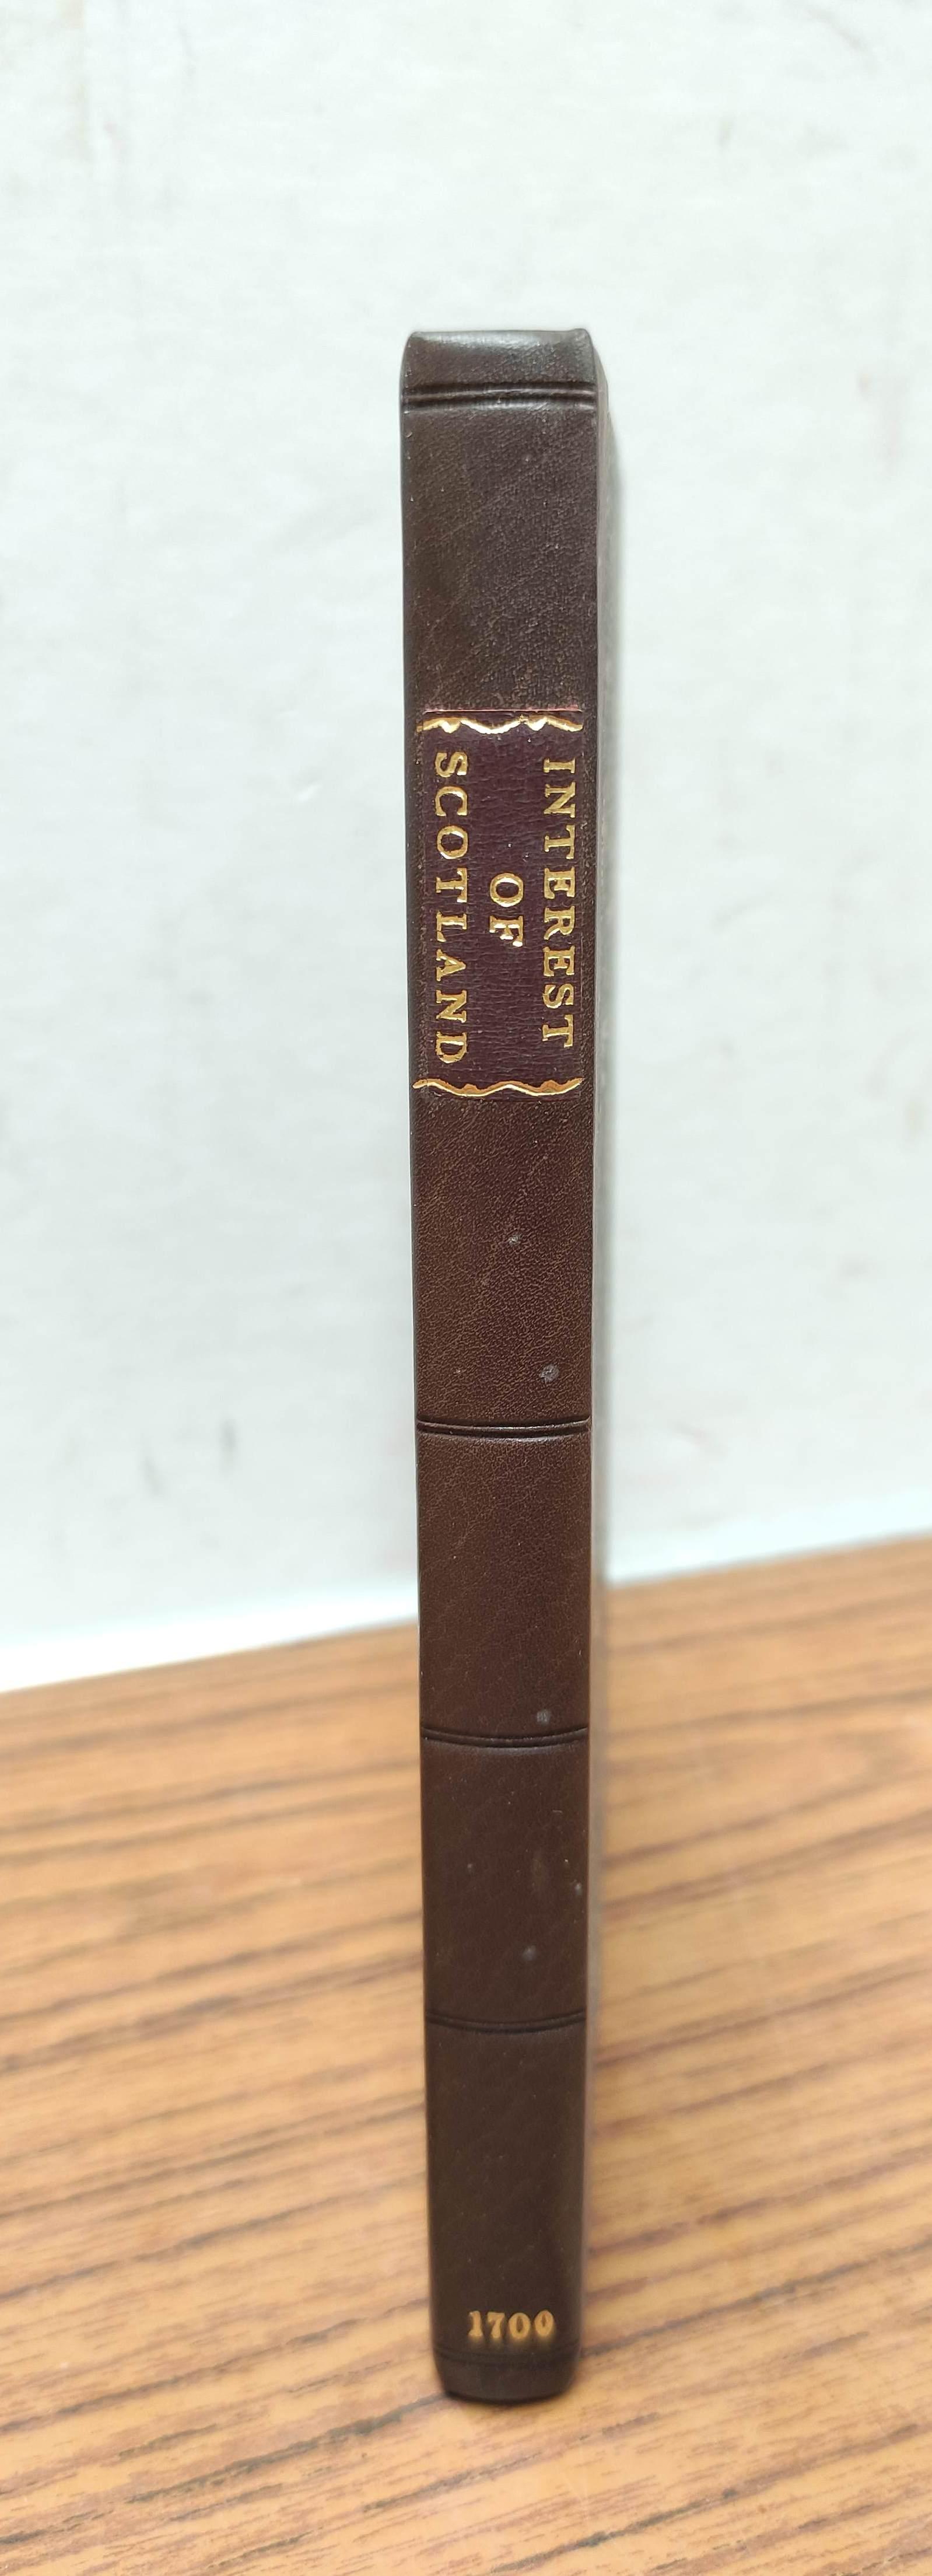 (SETON WILLIAM). The Interest of Scotland in Three Essays. 114pp. Rebound qtr. calf, marbled - Image 2 of 5